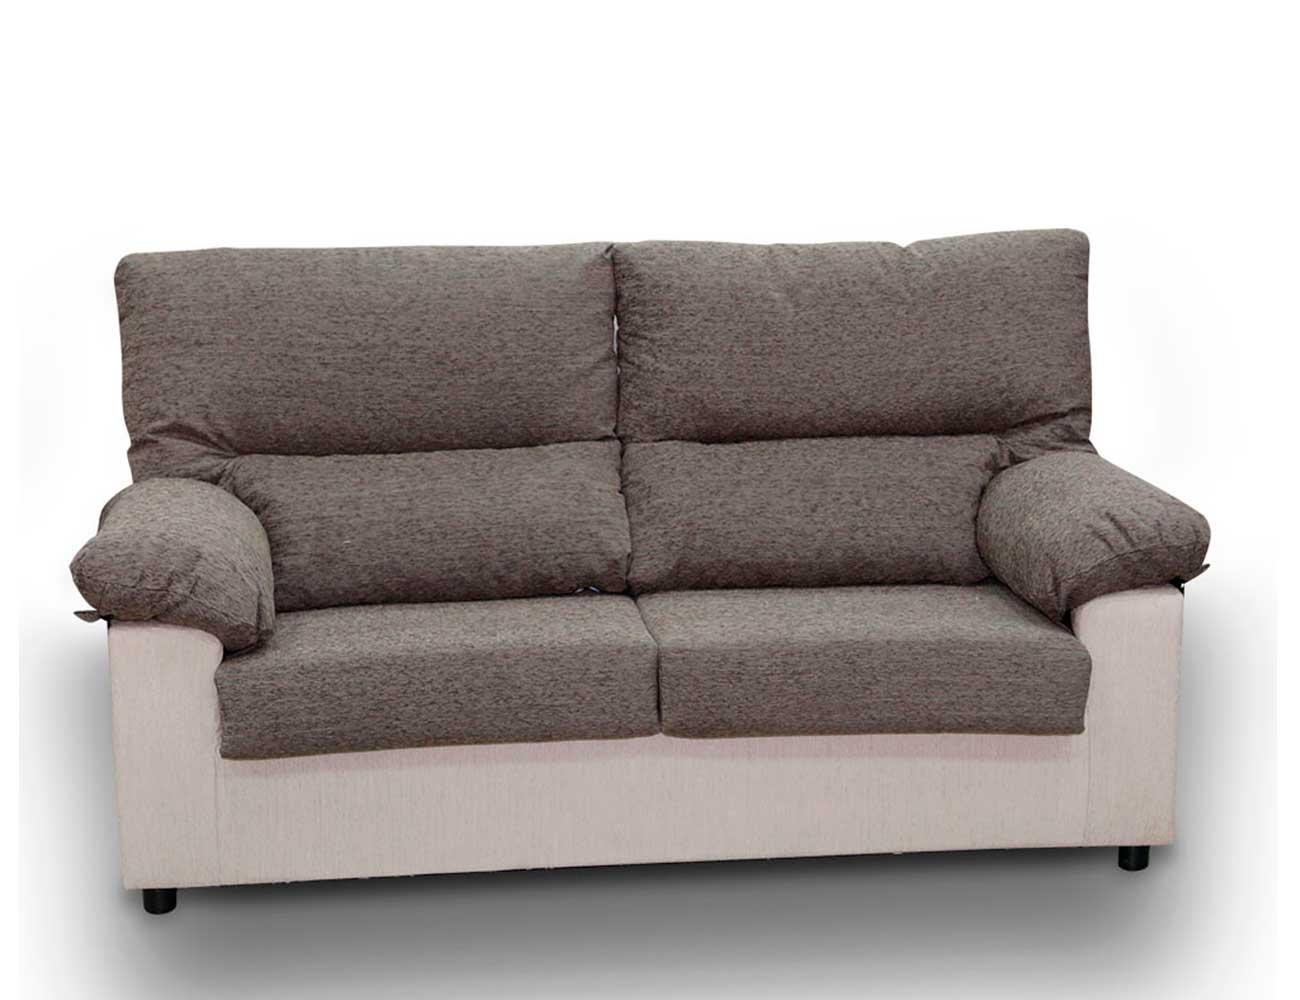 Sofa 3 plazas barato26